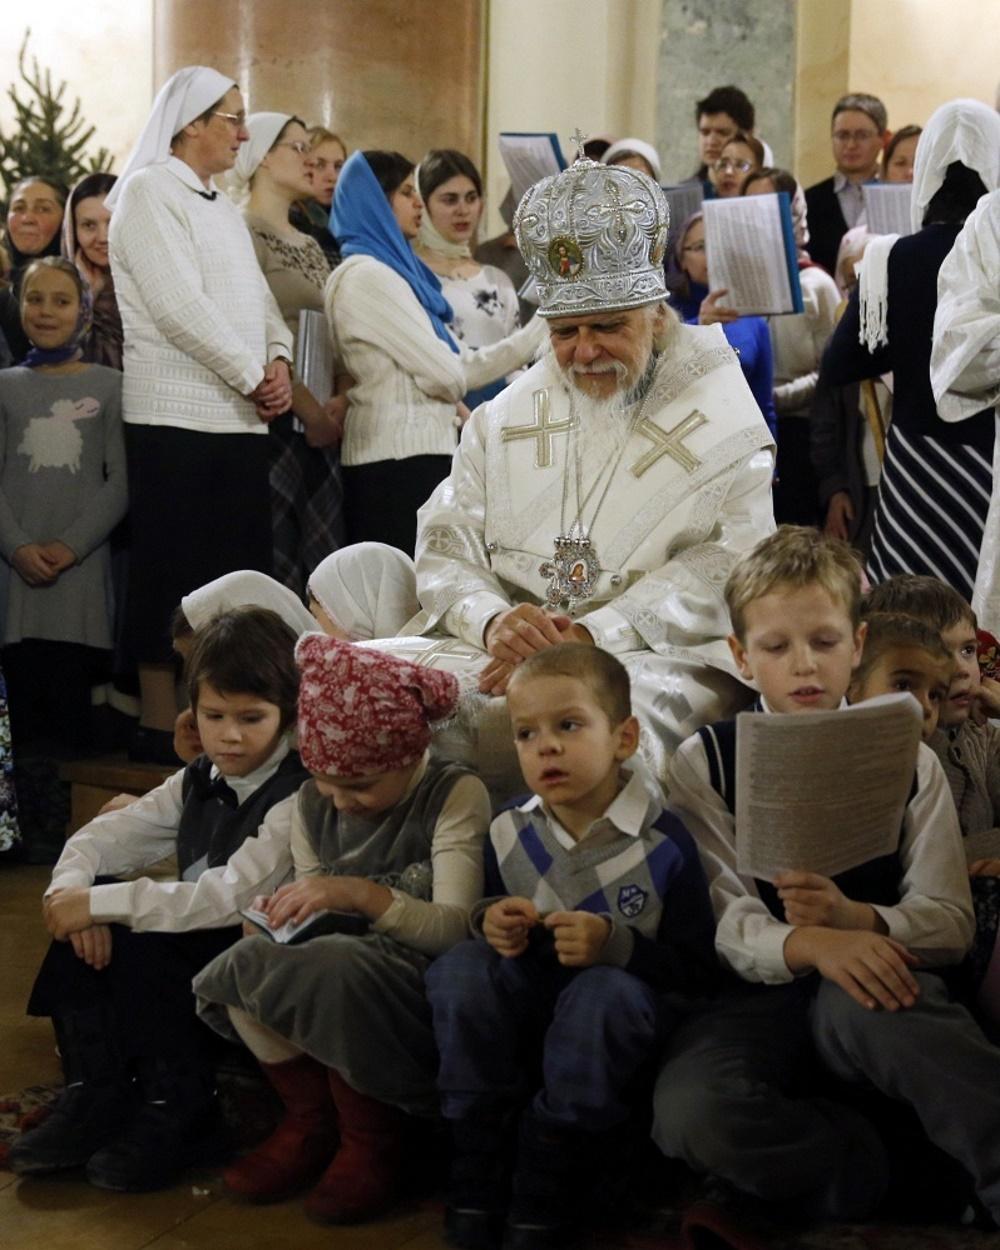 00 Orthodox Christmas 05. 07.01.14